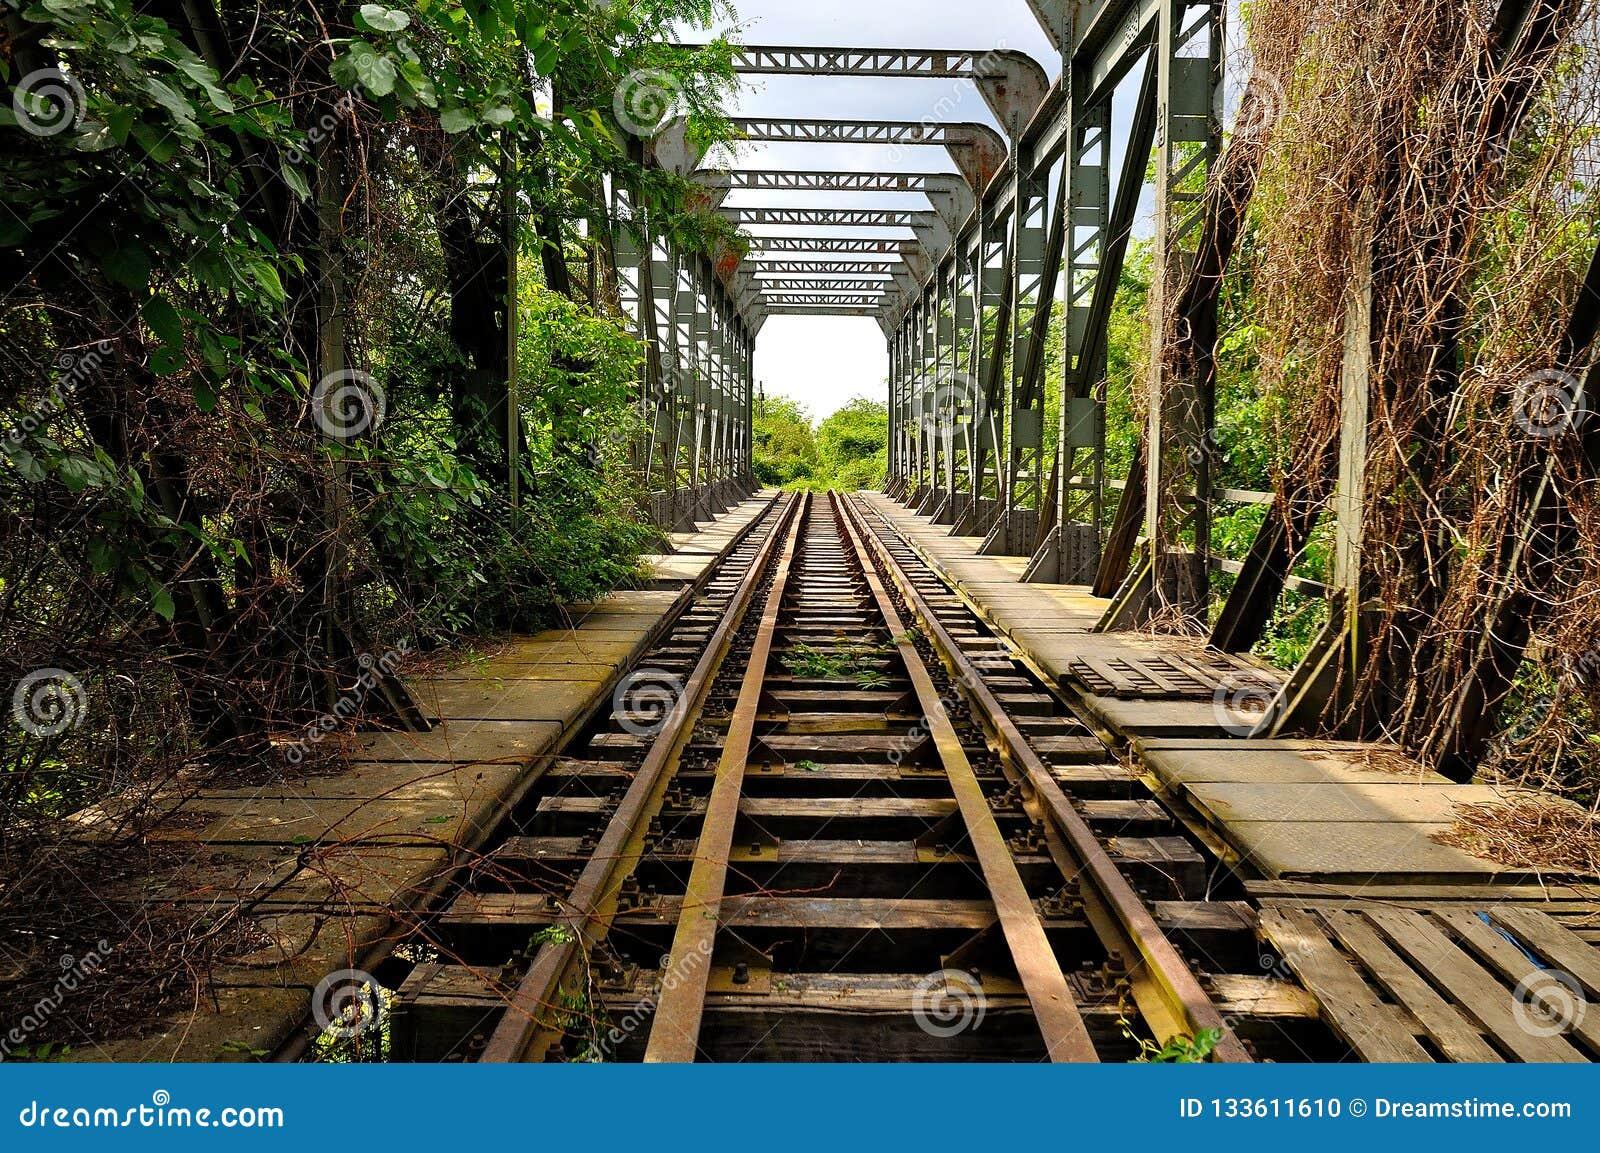 The first railroad in Romania Bucuresti-Giurgiu